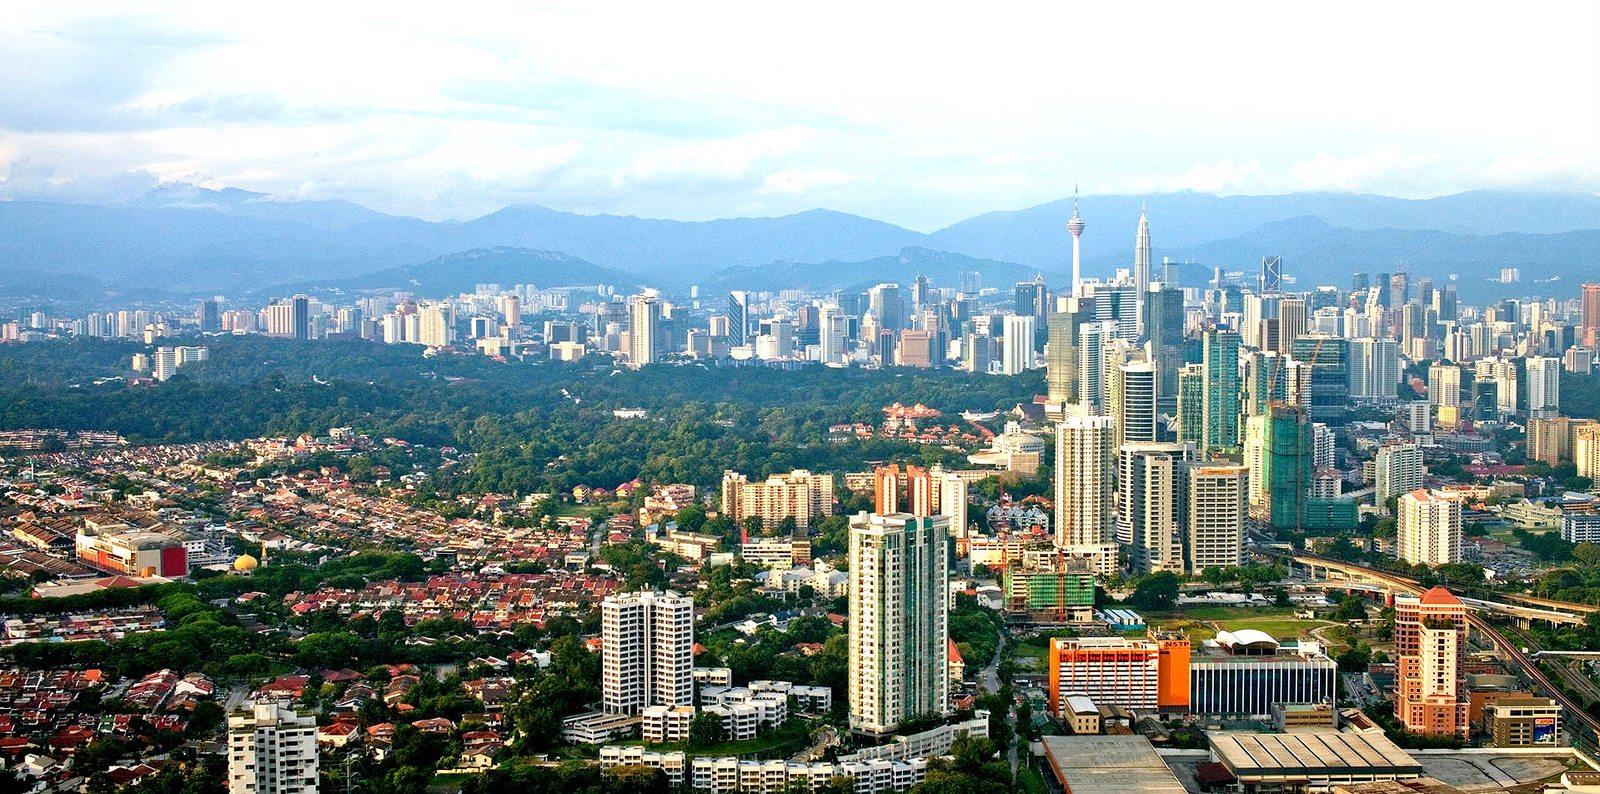 Sports tour to Malaysia - Kuala Lumpur city centre